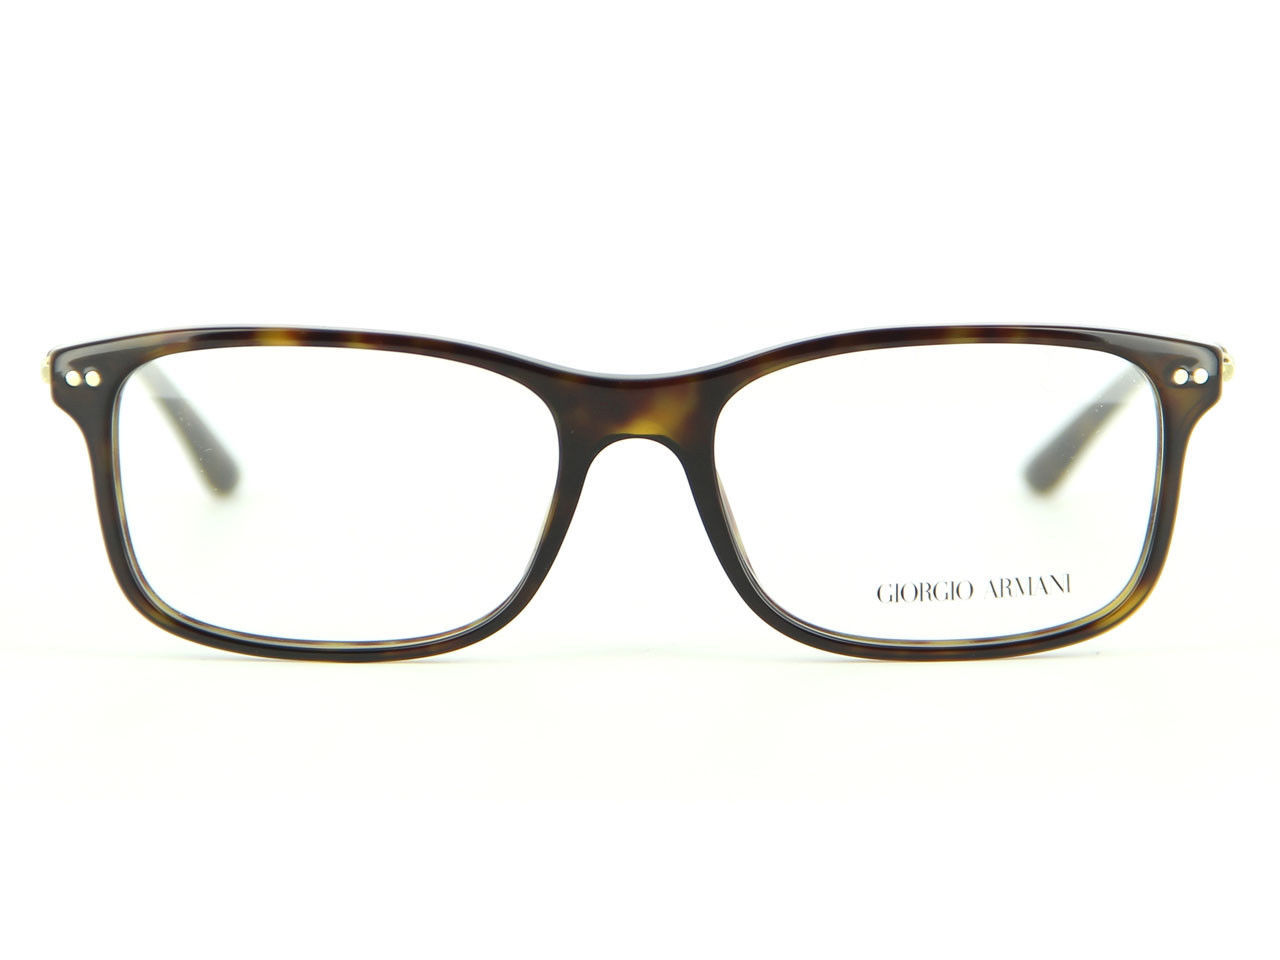 74c3d67aa8 ... Giorgio Armani AR7024 5026 Eyeglasses Havana Brown Frame 55mm ...